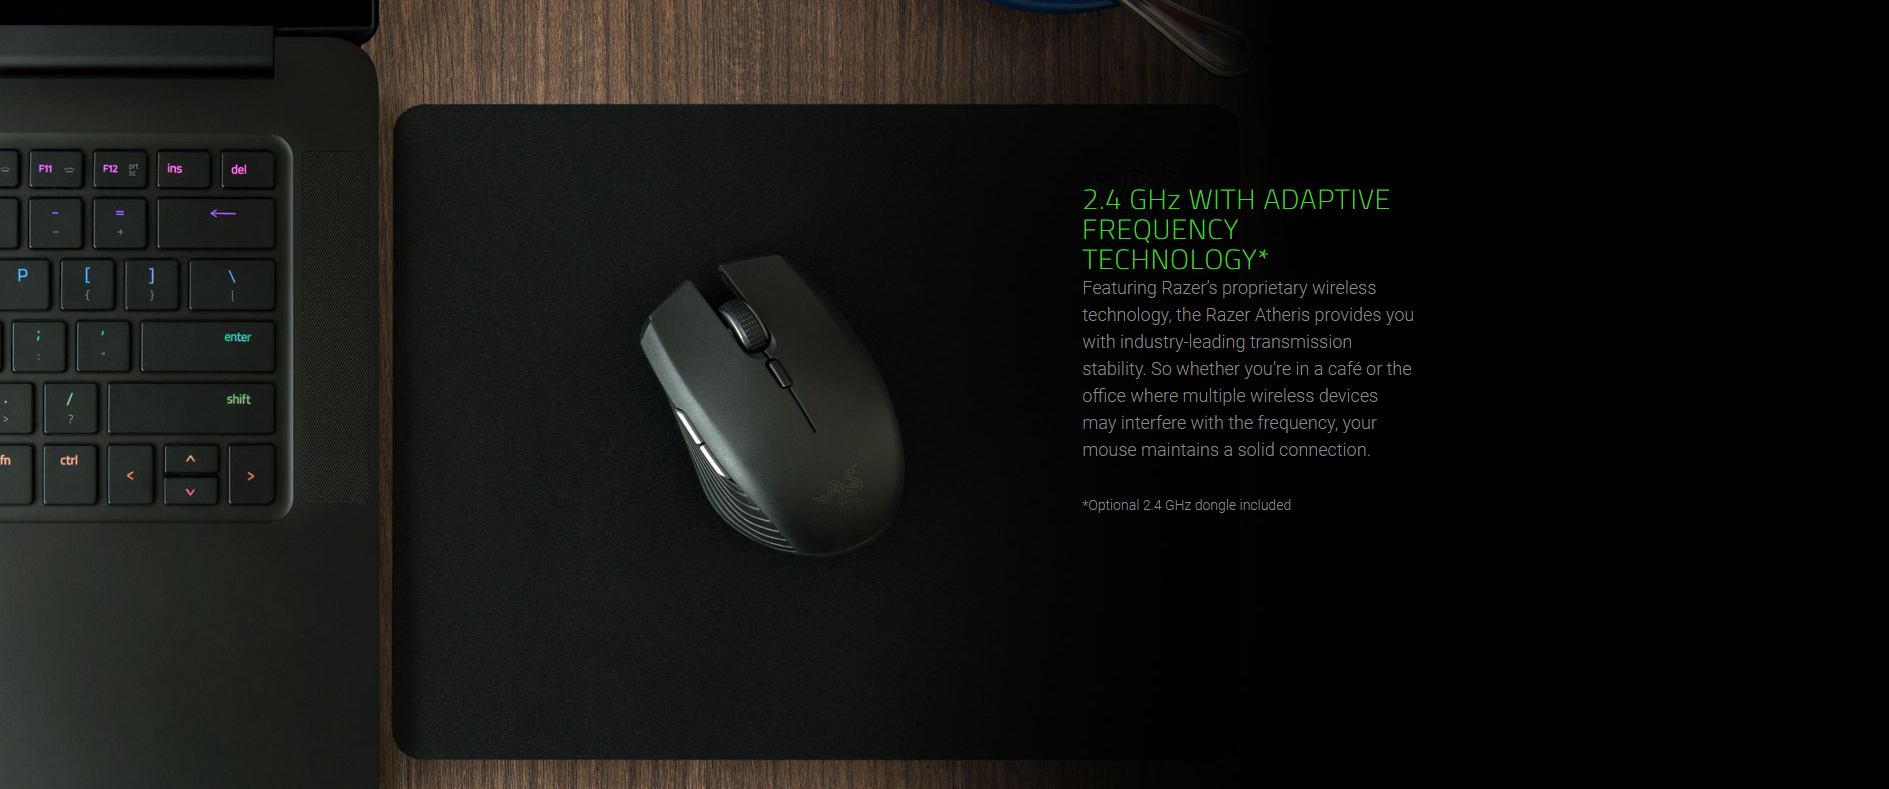 Razer Atheris Mobile Gaming Mouse - Dual 2 4 GHz and Bluetooth LE  connectivity (6 button 7200dpi Optical Sensor) RZ01-02170100-R3A1